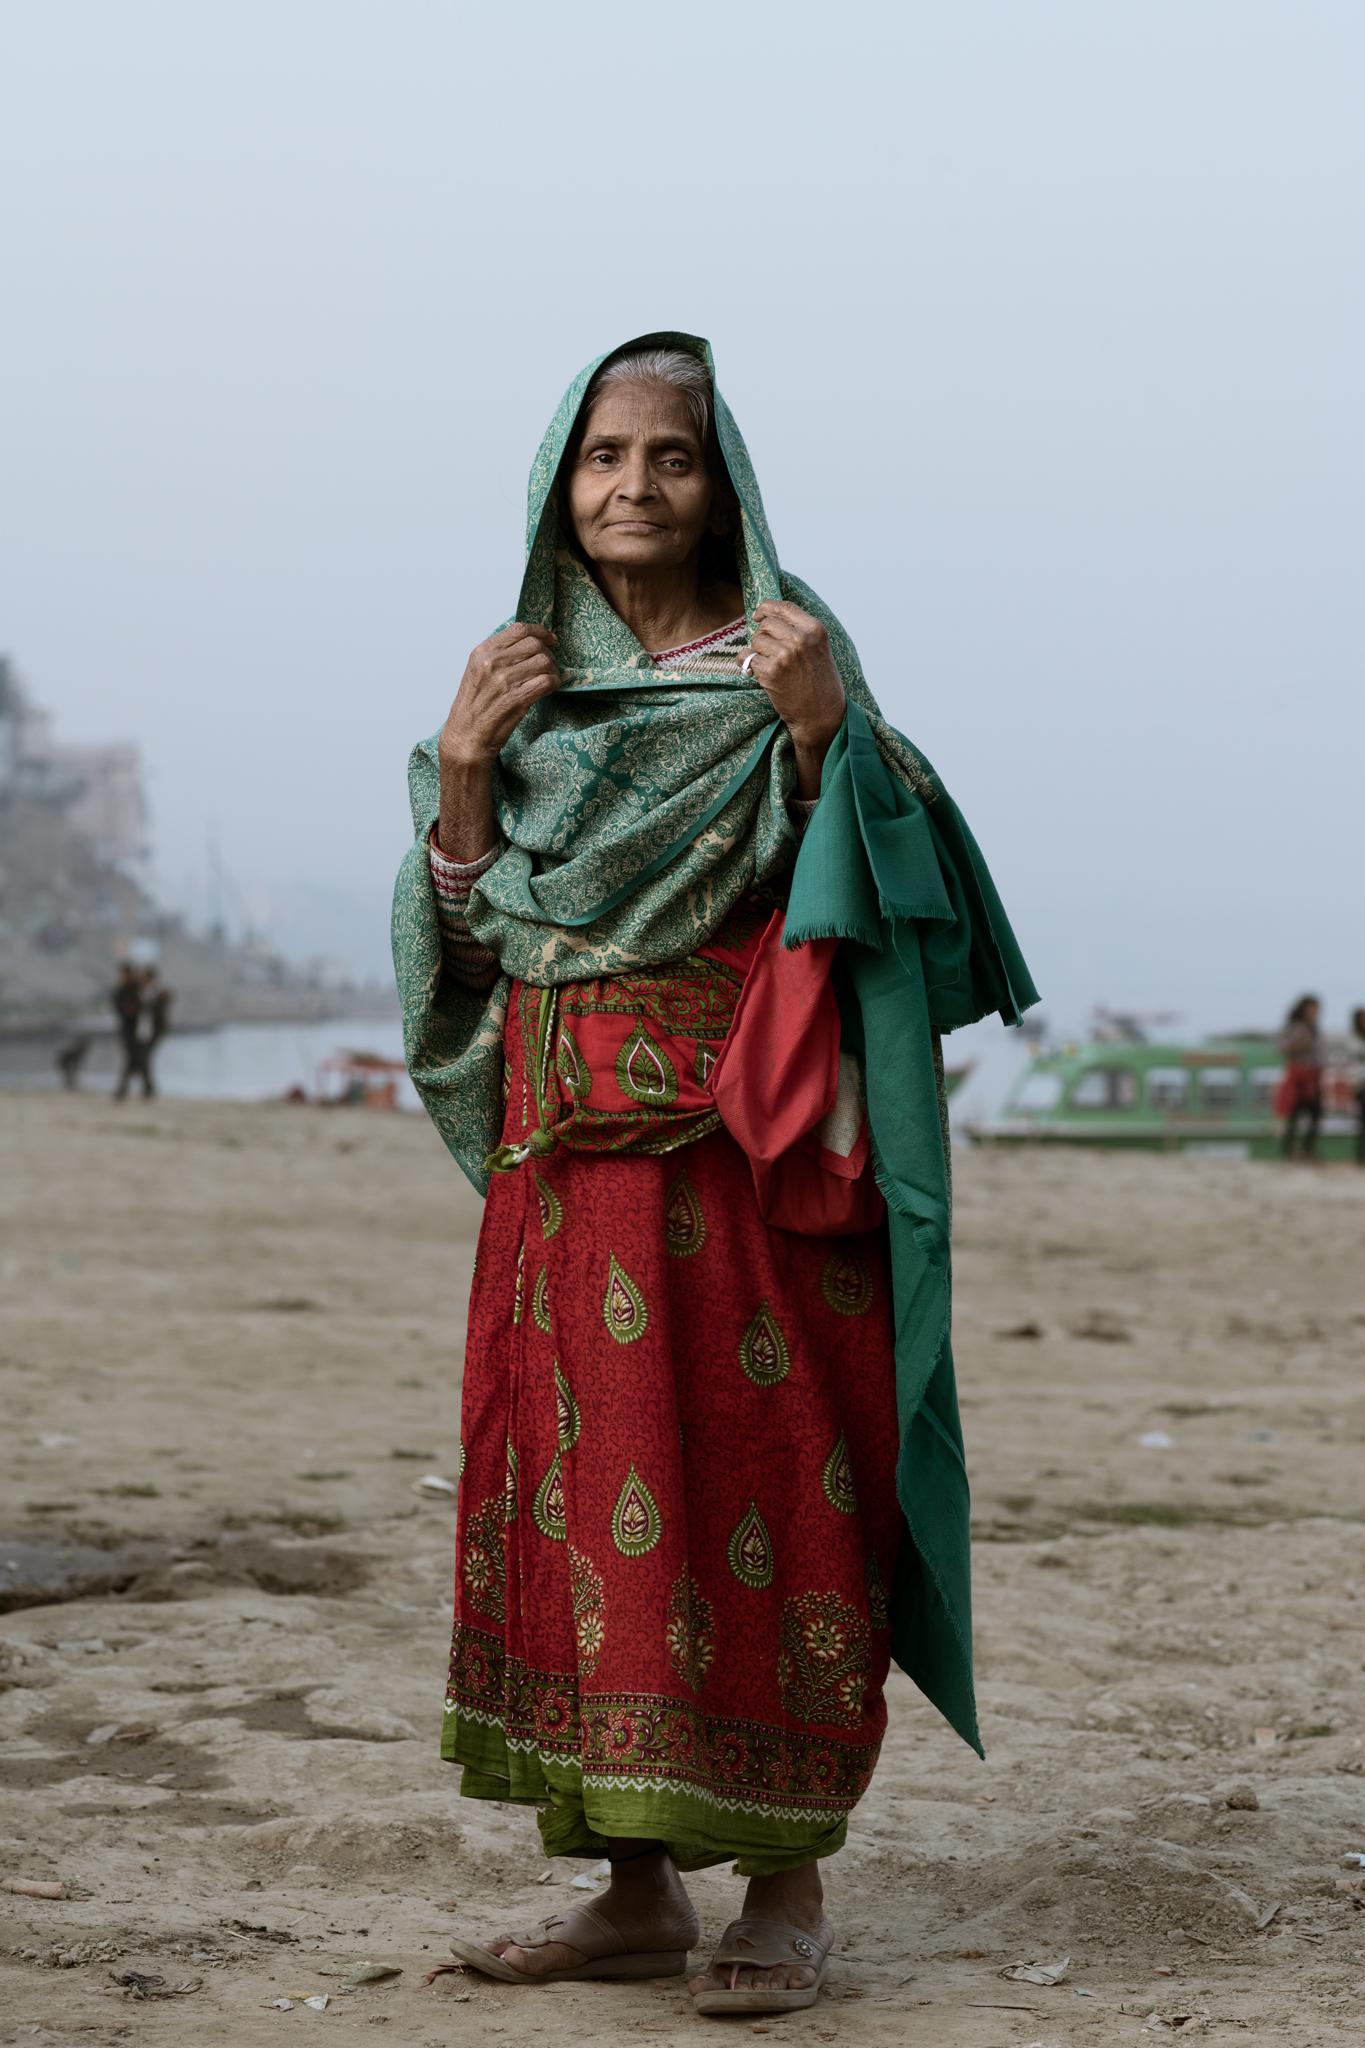 Varanasi_portrait_travel_photography_Manchester_Adventure_Photographer_Jan_Bella41.jpg